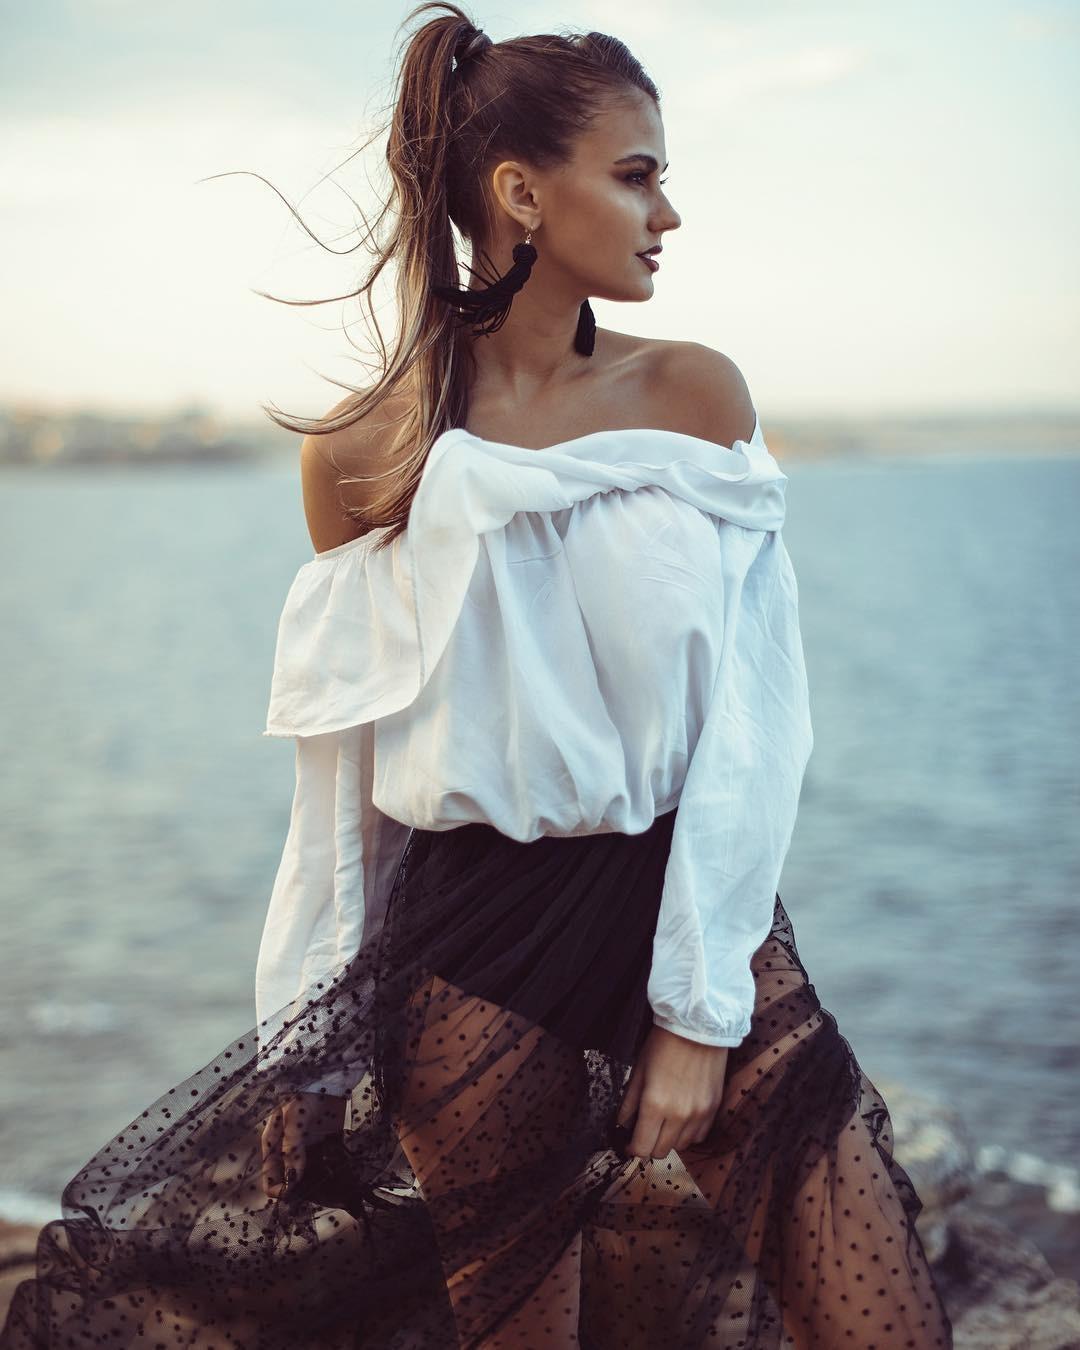 Pia Muehlenbeck nude (37 photos), Tits, Cleavage, Feet, underwear 2017